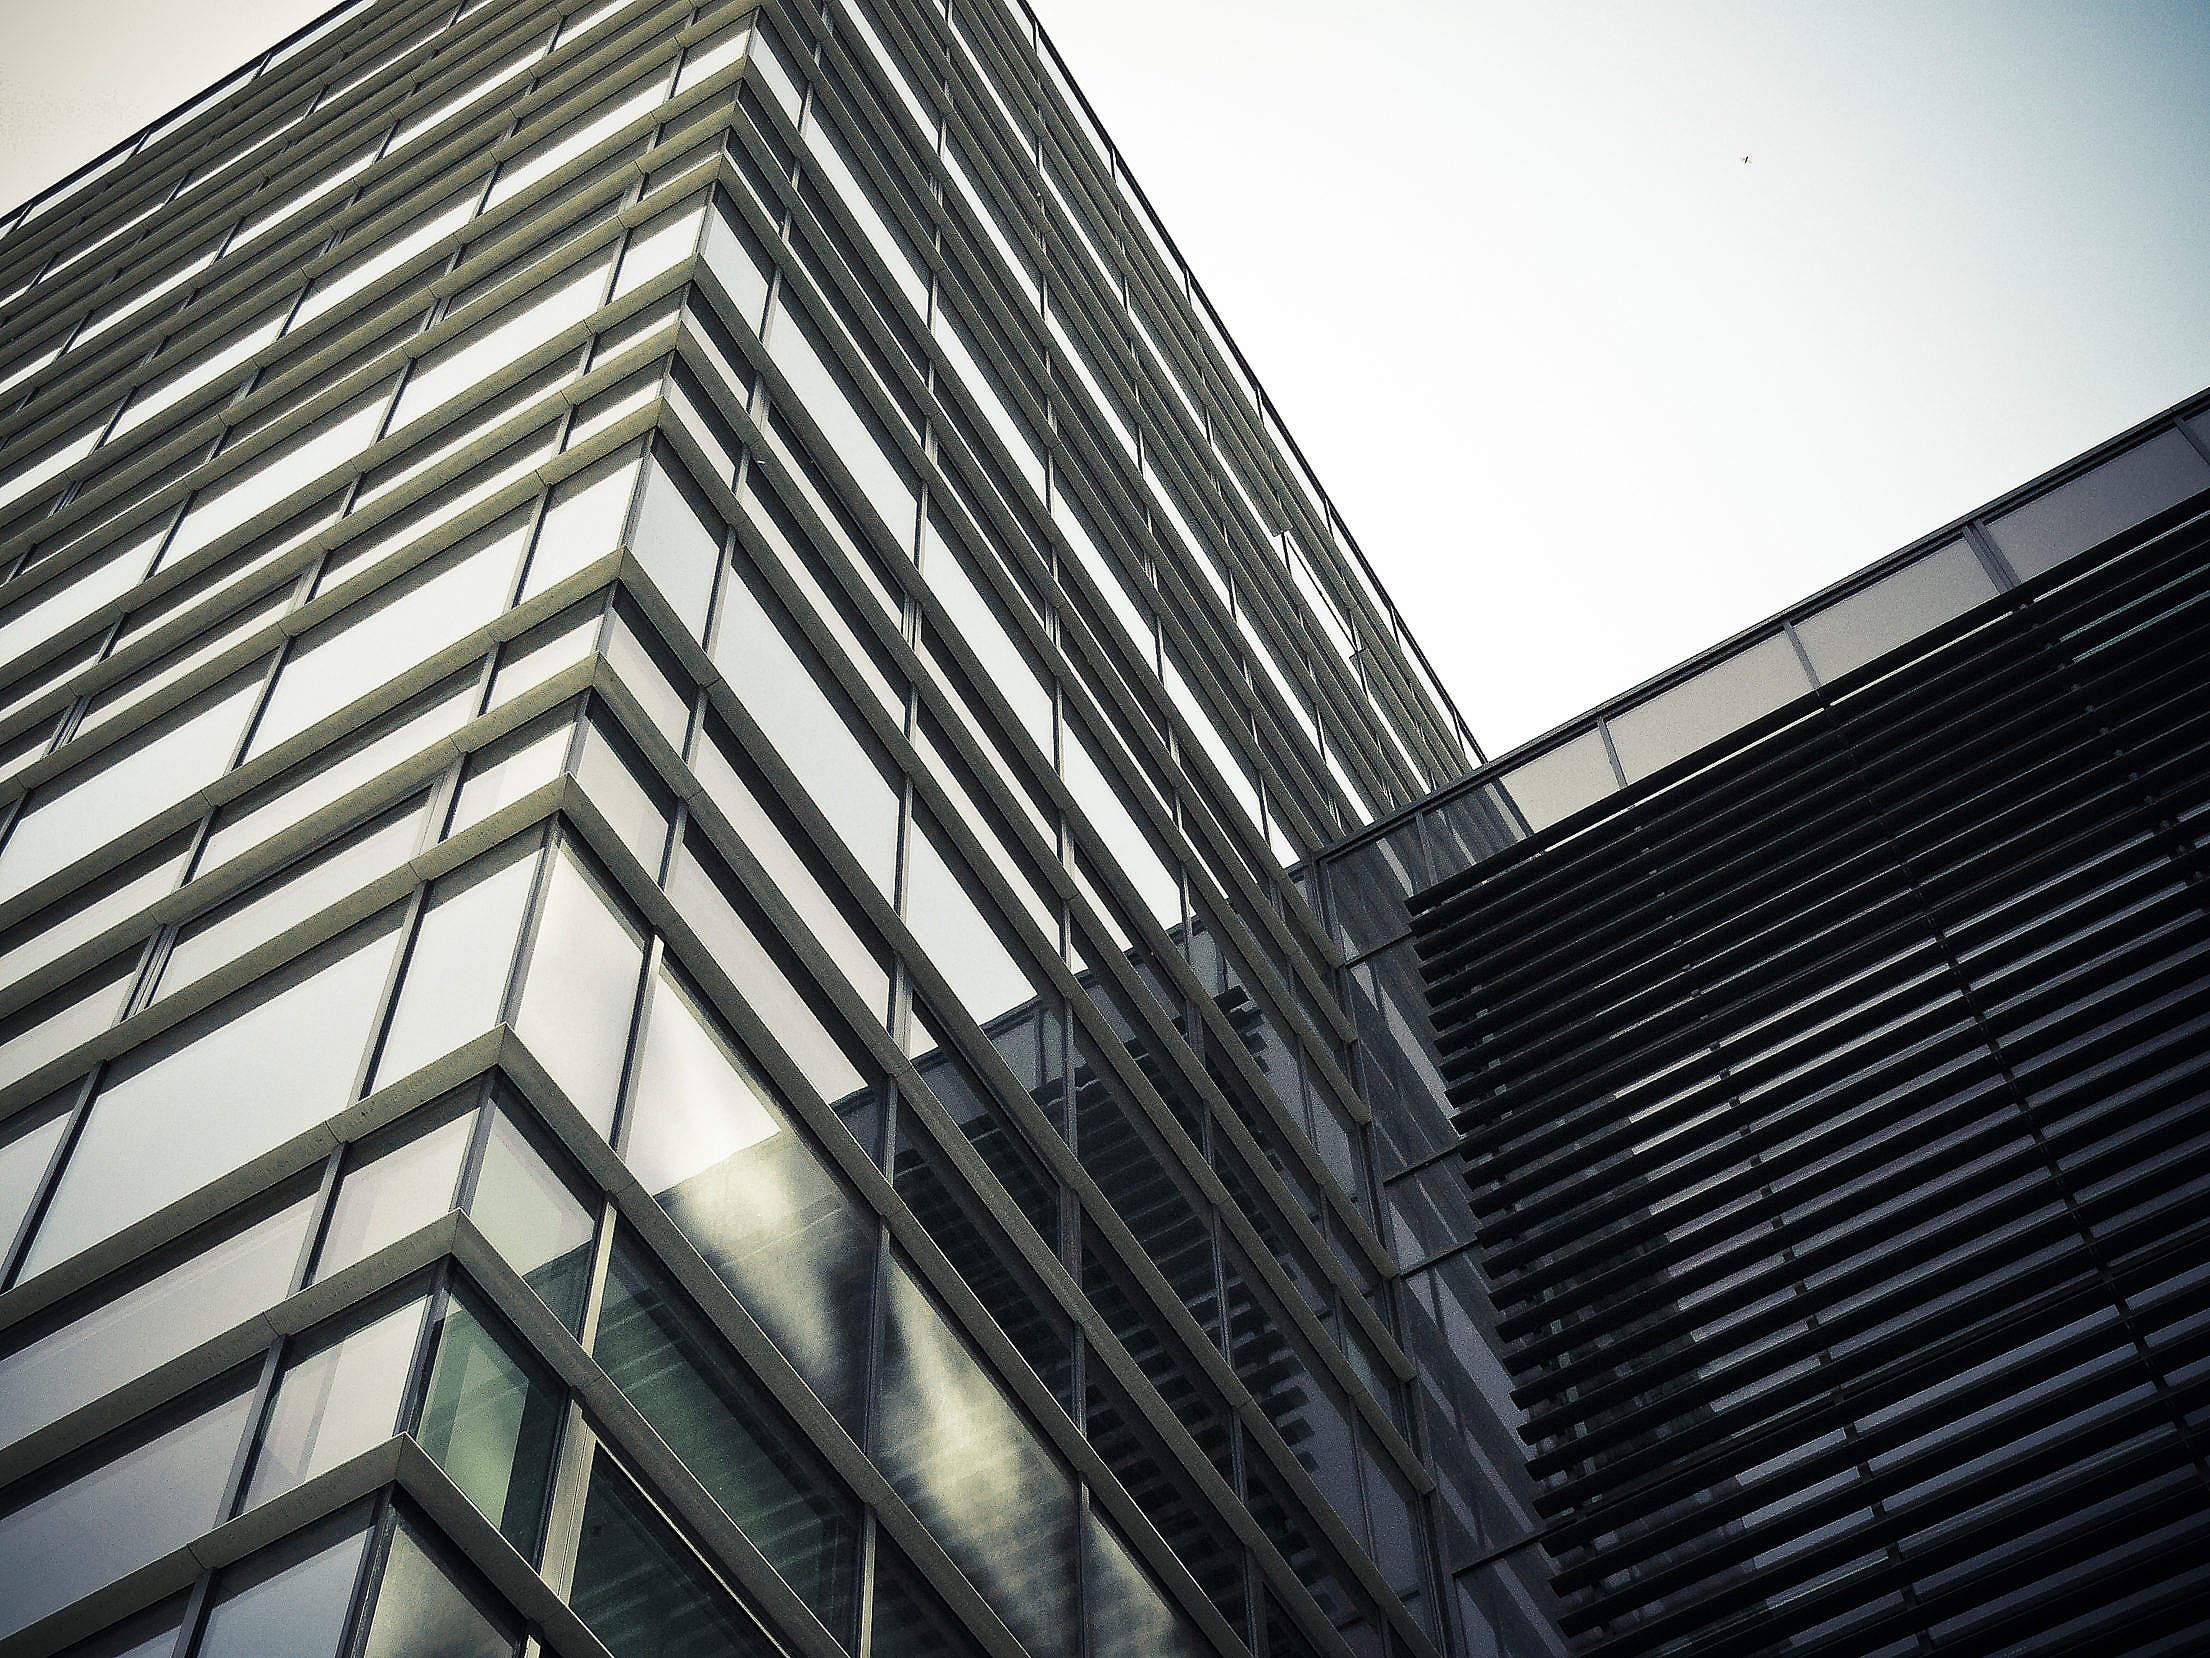 Modern Building Windows Free Stock Photo